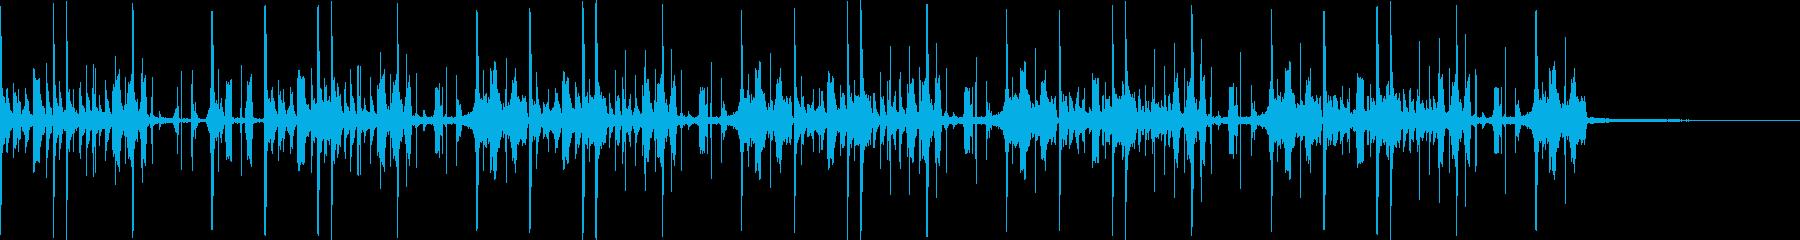 EDM オーガニックで楽しい曲ですの再生済みの波形